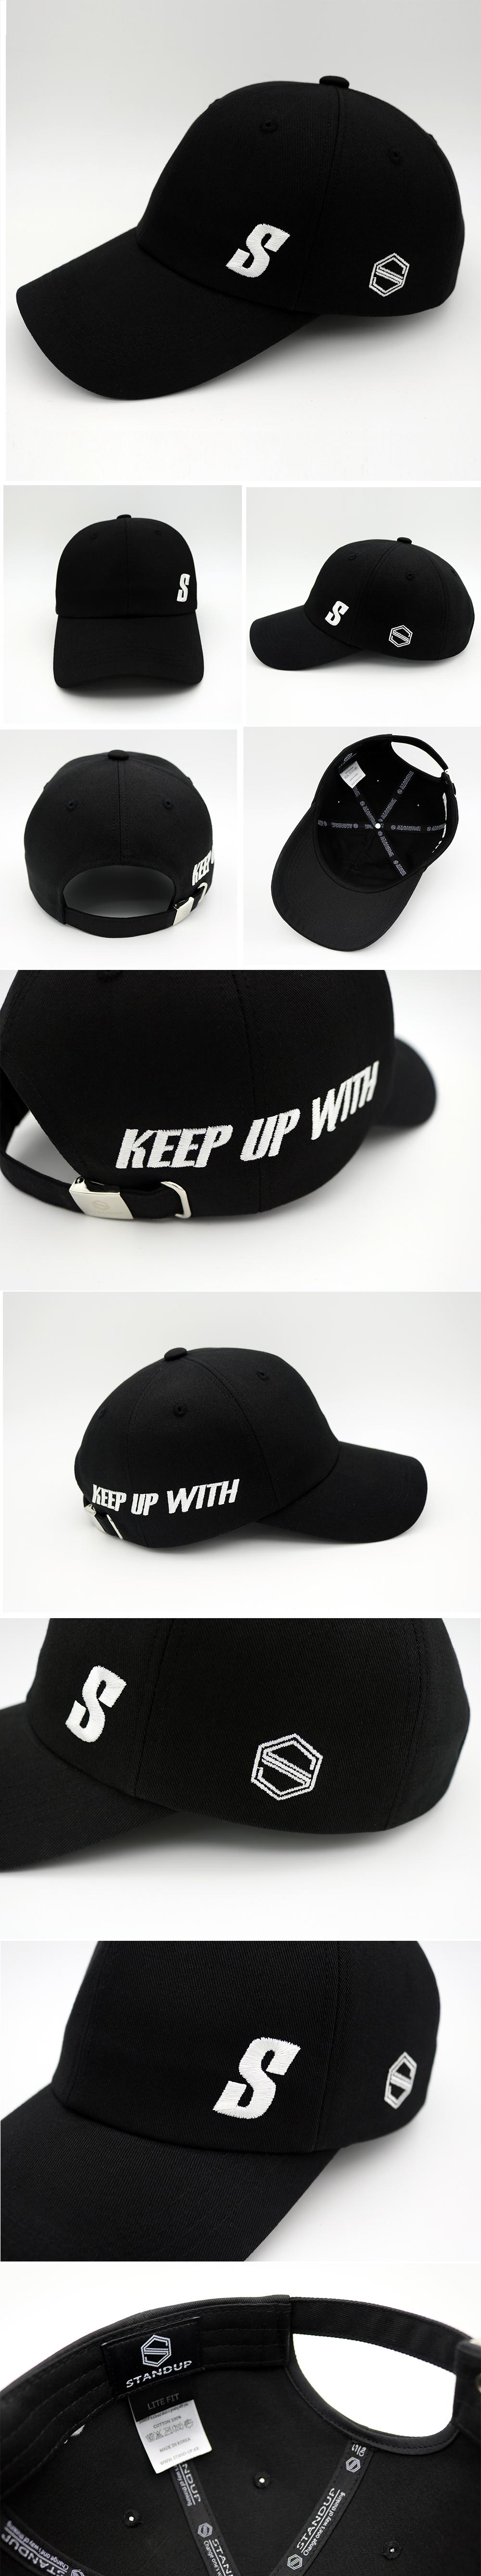 keppupwithS_black.jpg